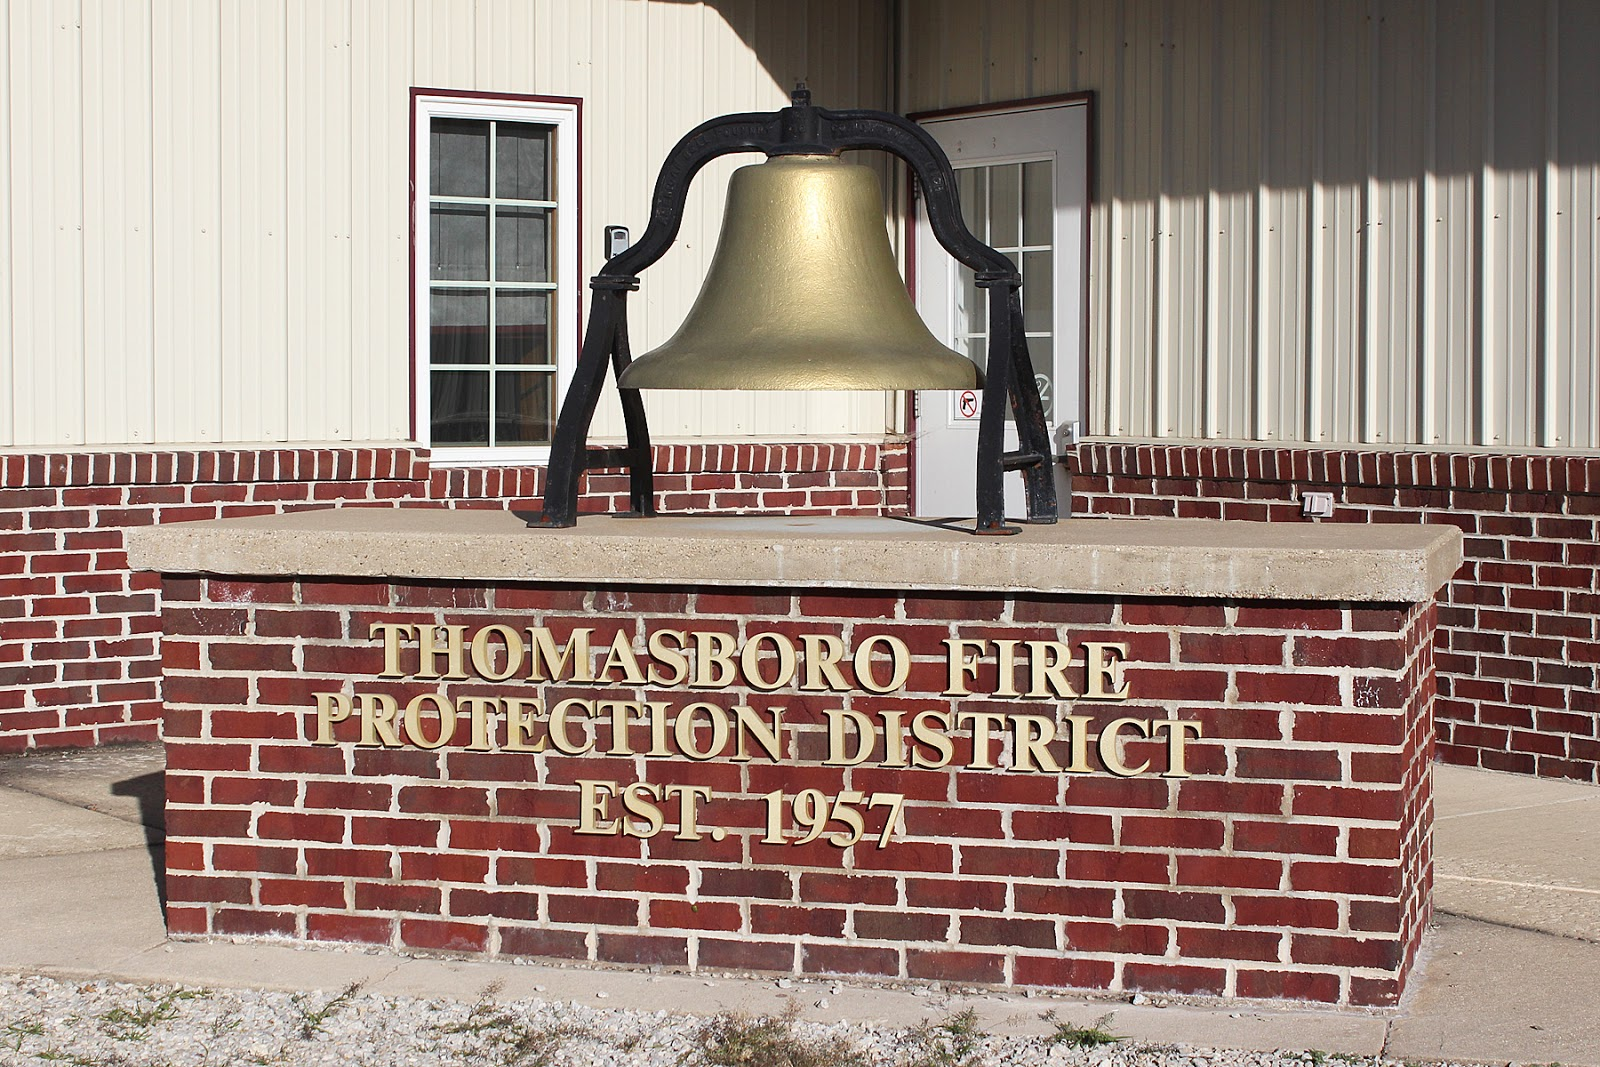 Illinois champaign county thomasboro - Thomasboro Fire Protection District 101 North Church Street Thomasboro Illinois Champaign County Established In 1957 Their Original Station Was